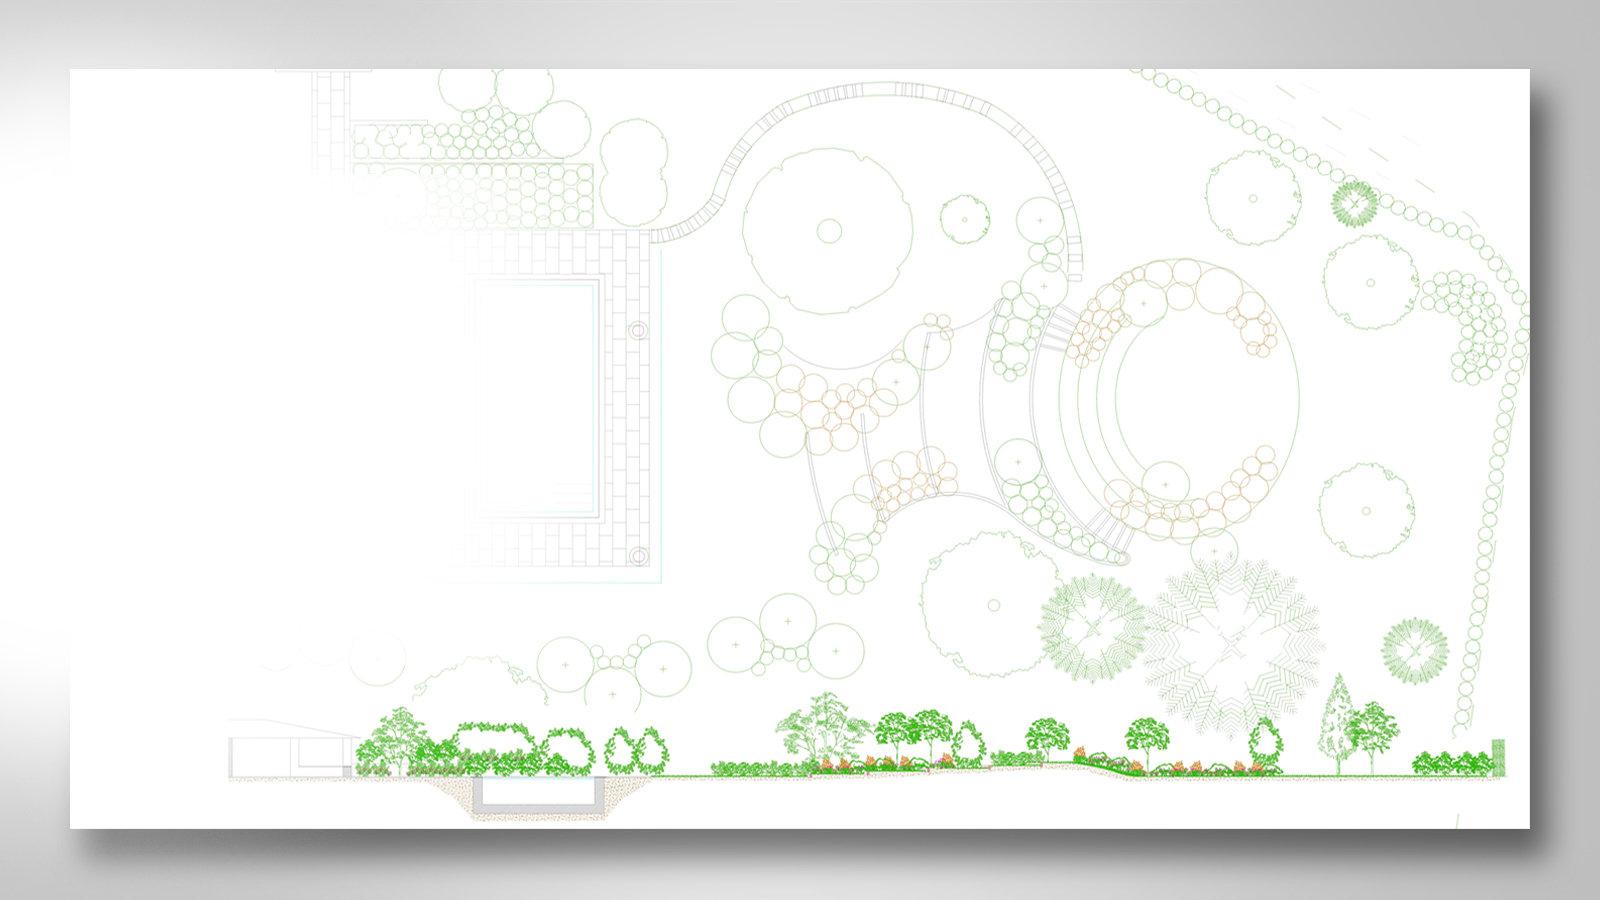 Beeches Transform - Landscape CAD drawings Leeds